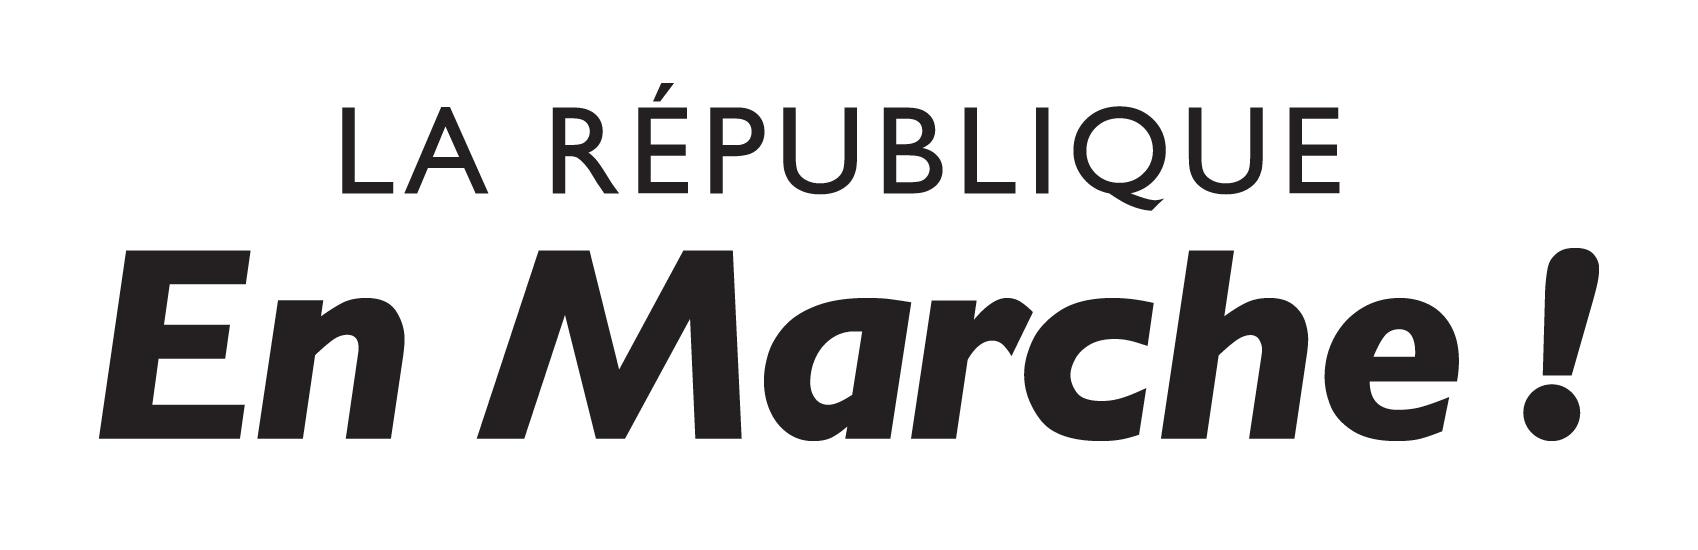 Logo LaRepubliqueEnMarche Noir